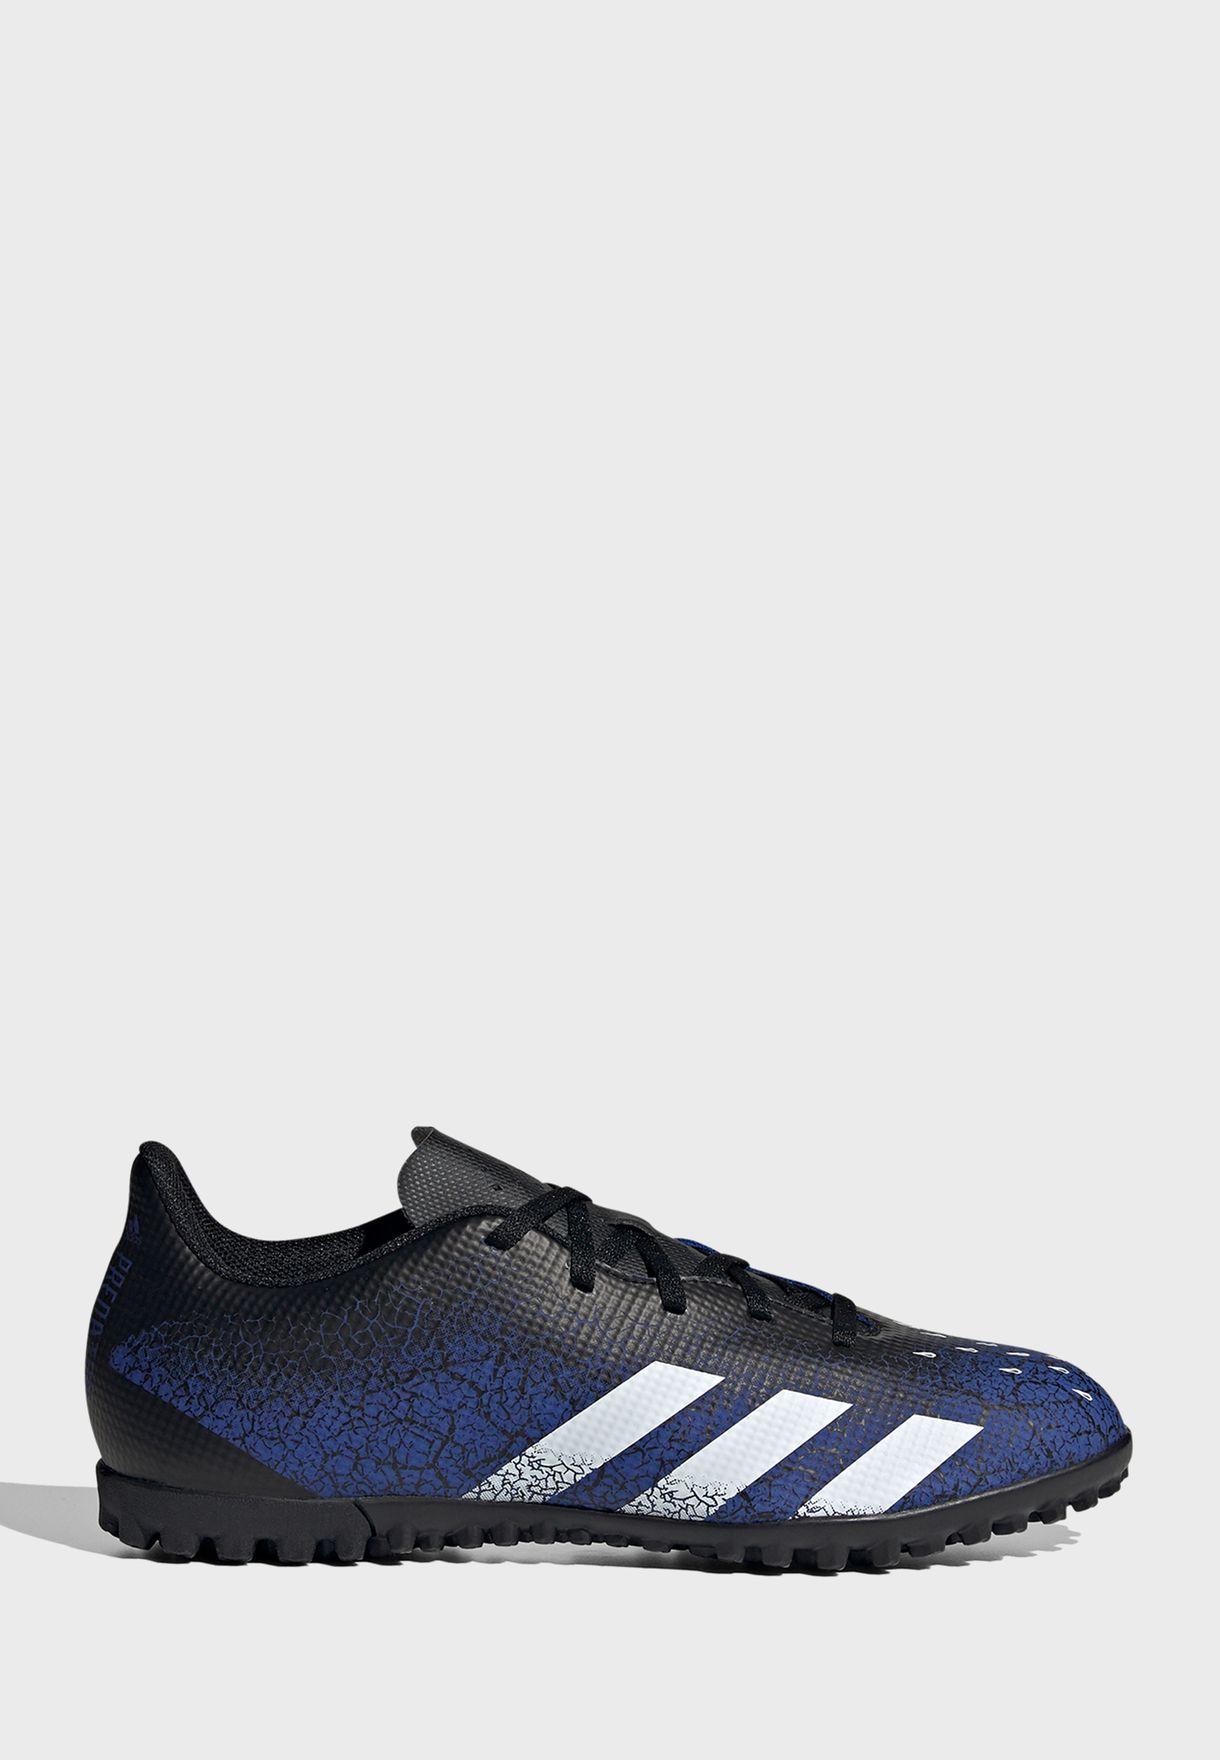 حذاء بريداتور فريك .4 تورف